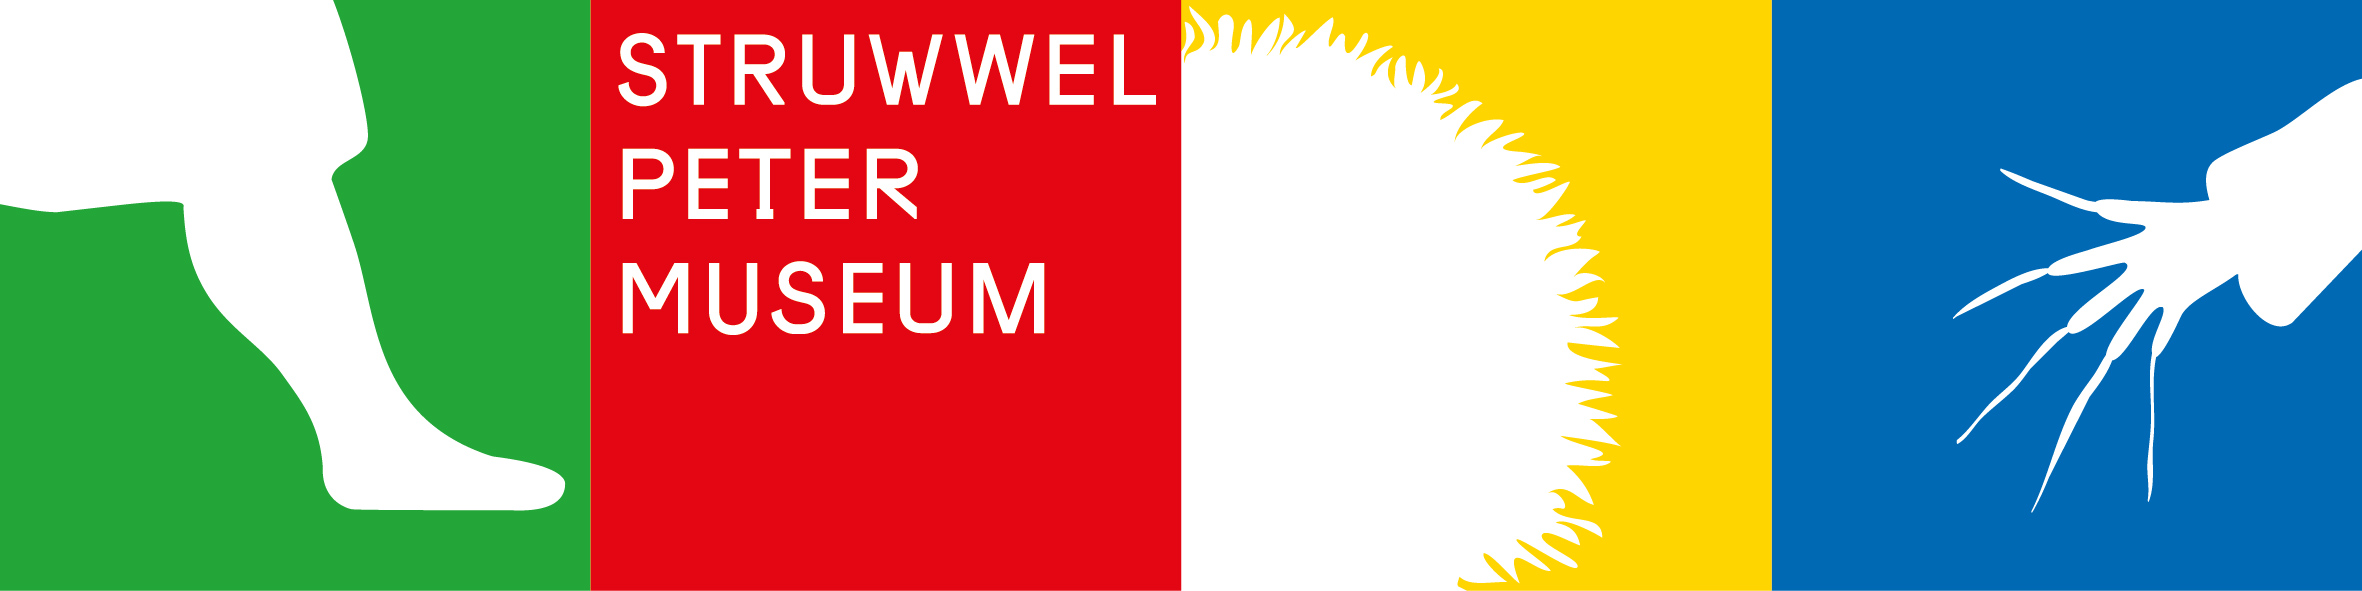 Struwwelpeter Museum Onlineshop